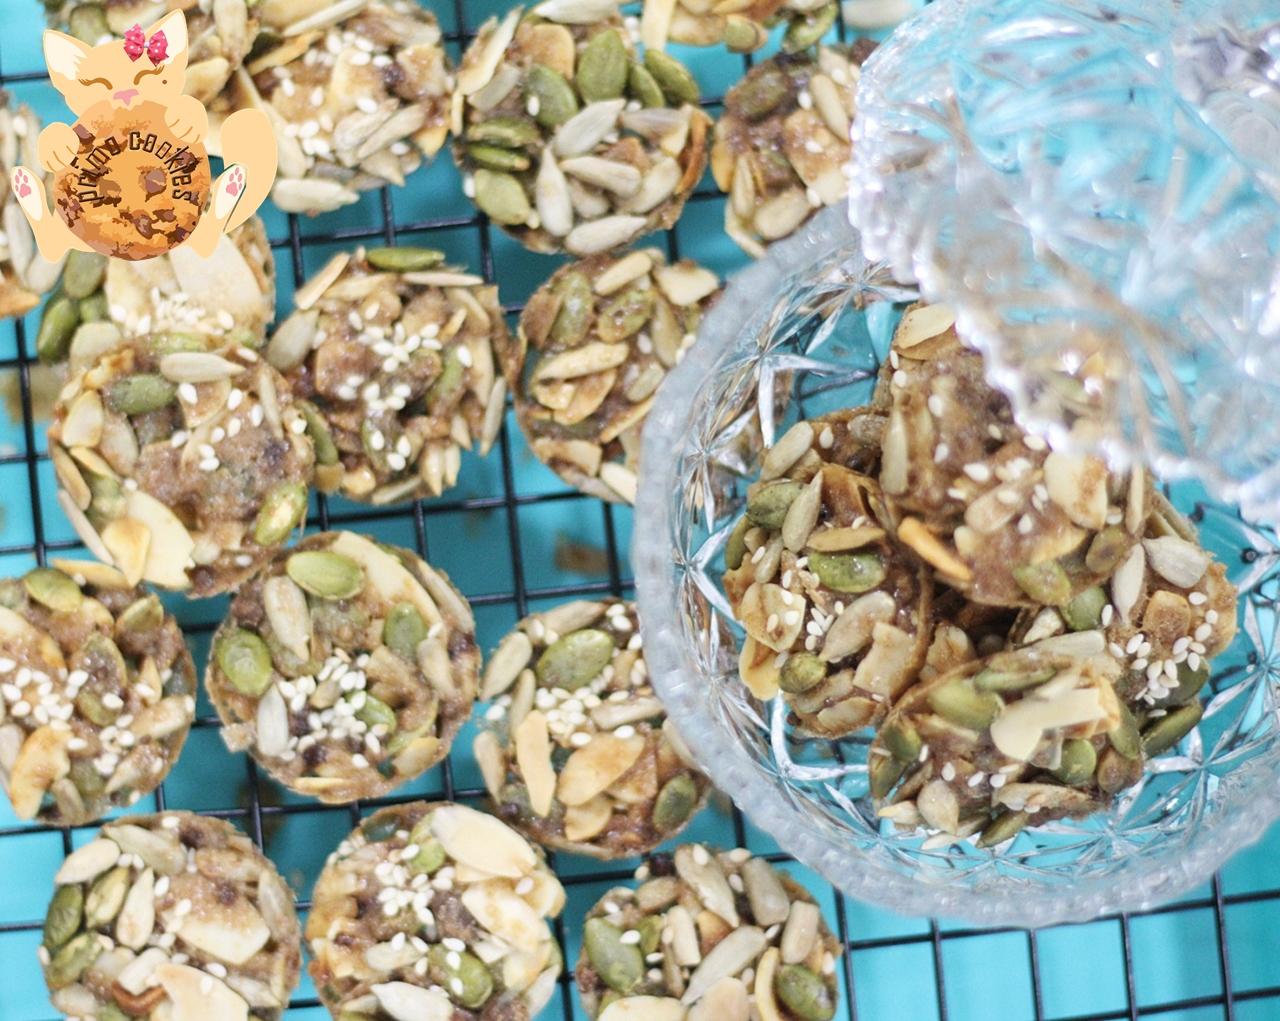 Gula Melaka Nutty Crunchy Florentine Cookies